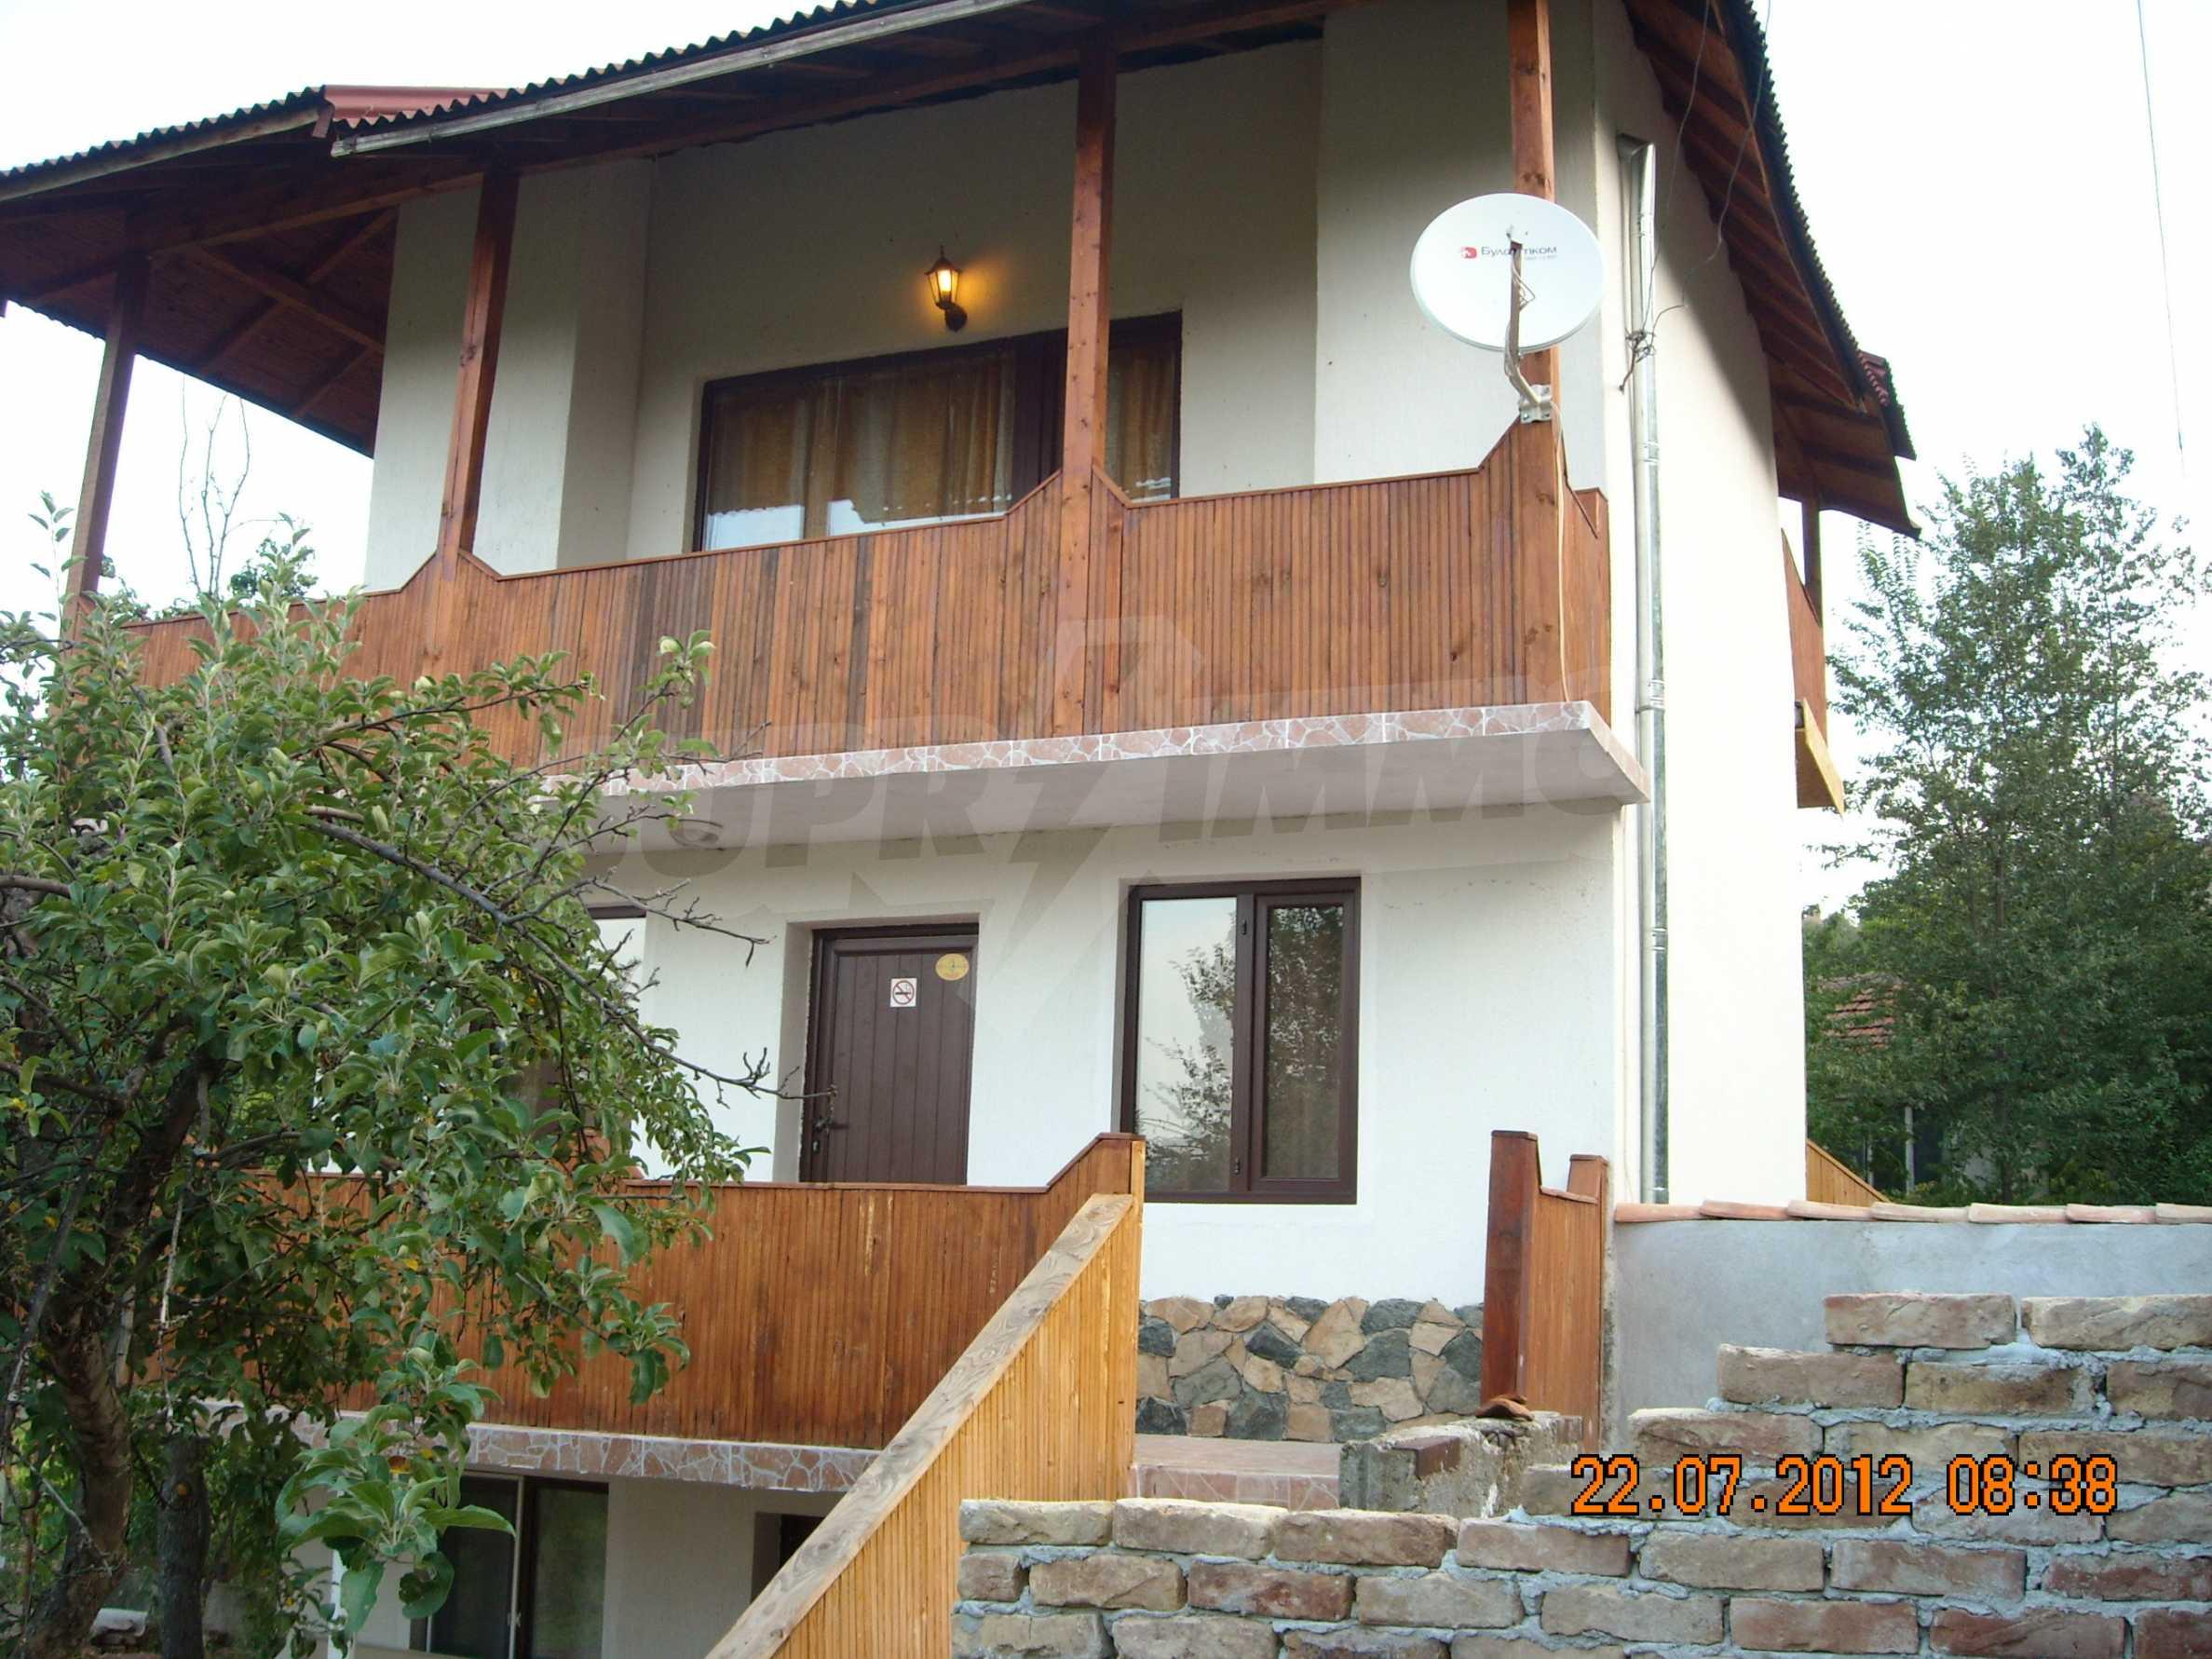 3-storey villa with garden and small plunge pool near Belogradchik